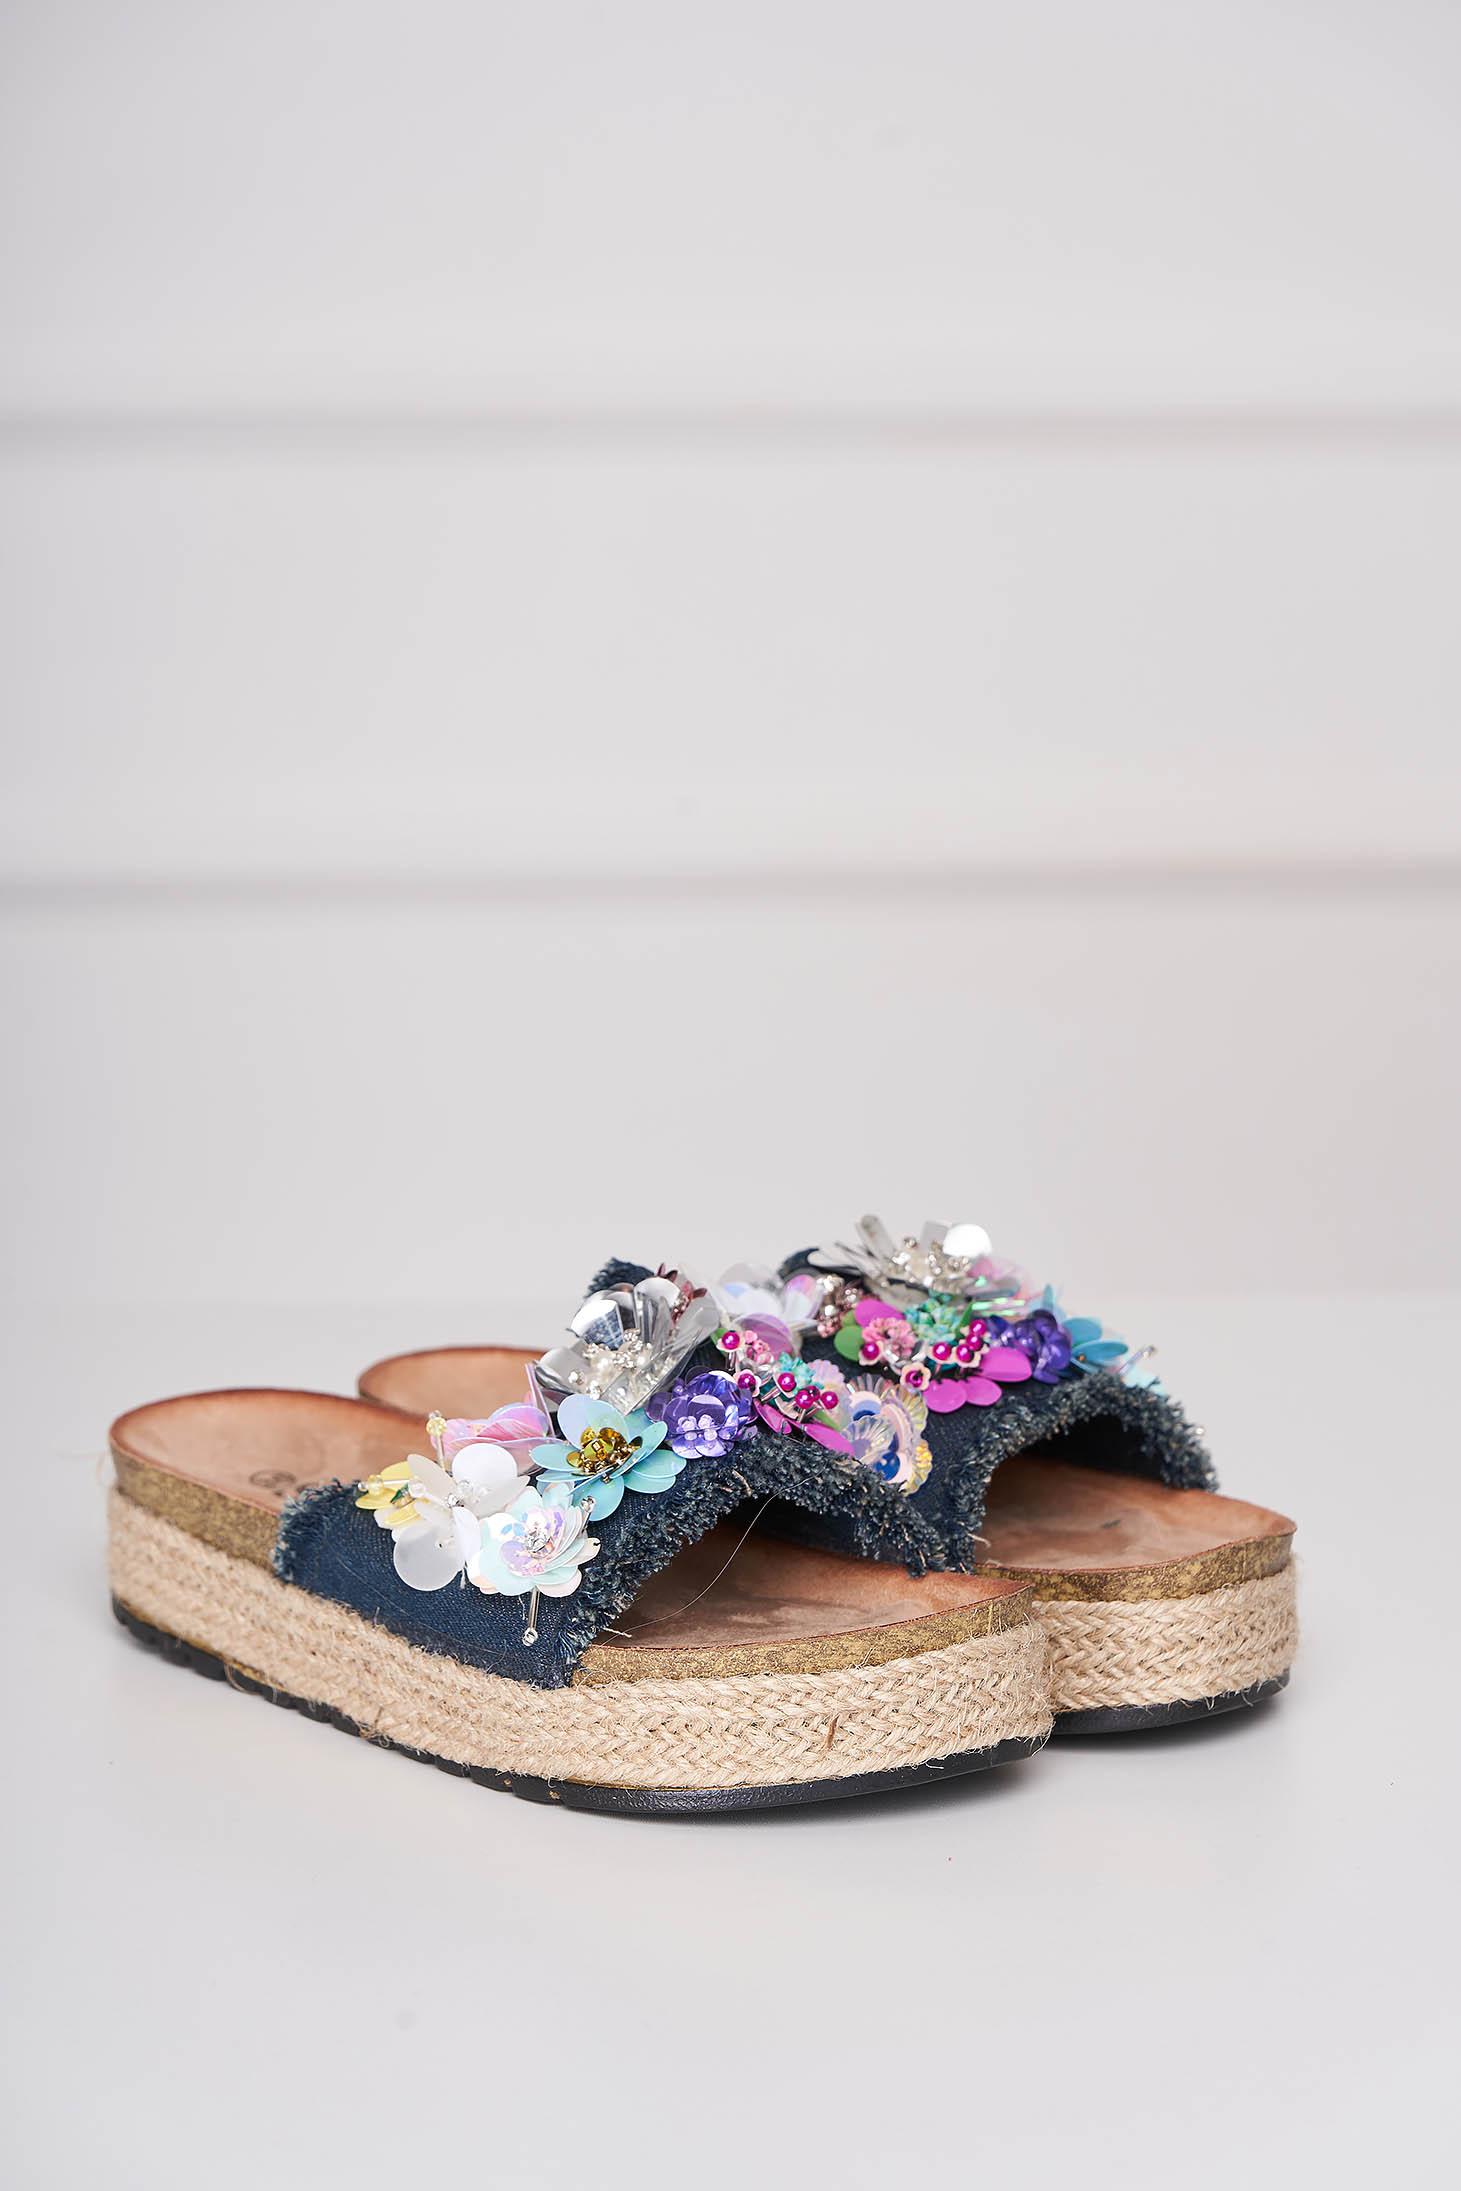 Darkblue casual denim slippers with sequin embellished details